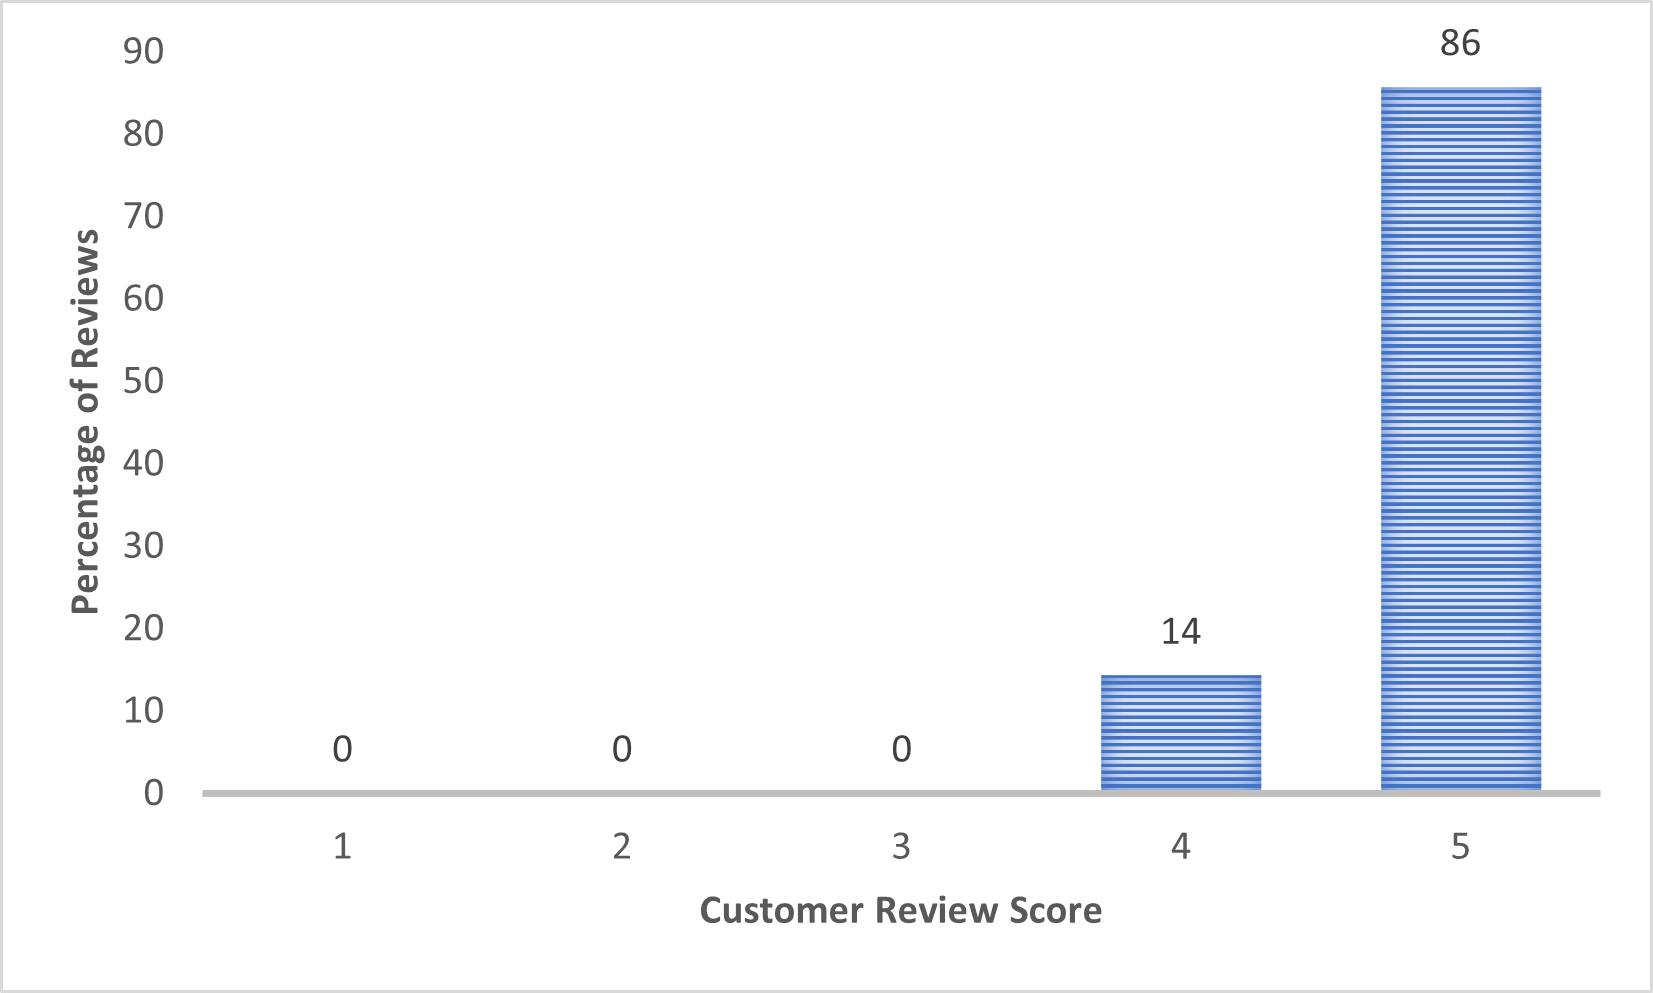 SweatStop Forte Roll-on Review Scores